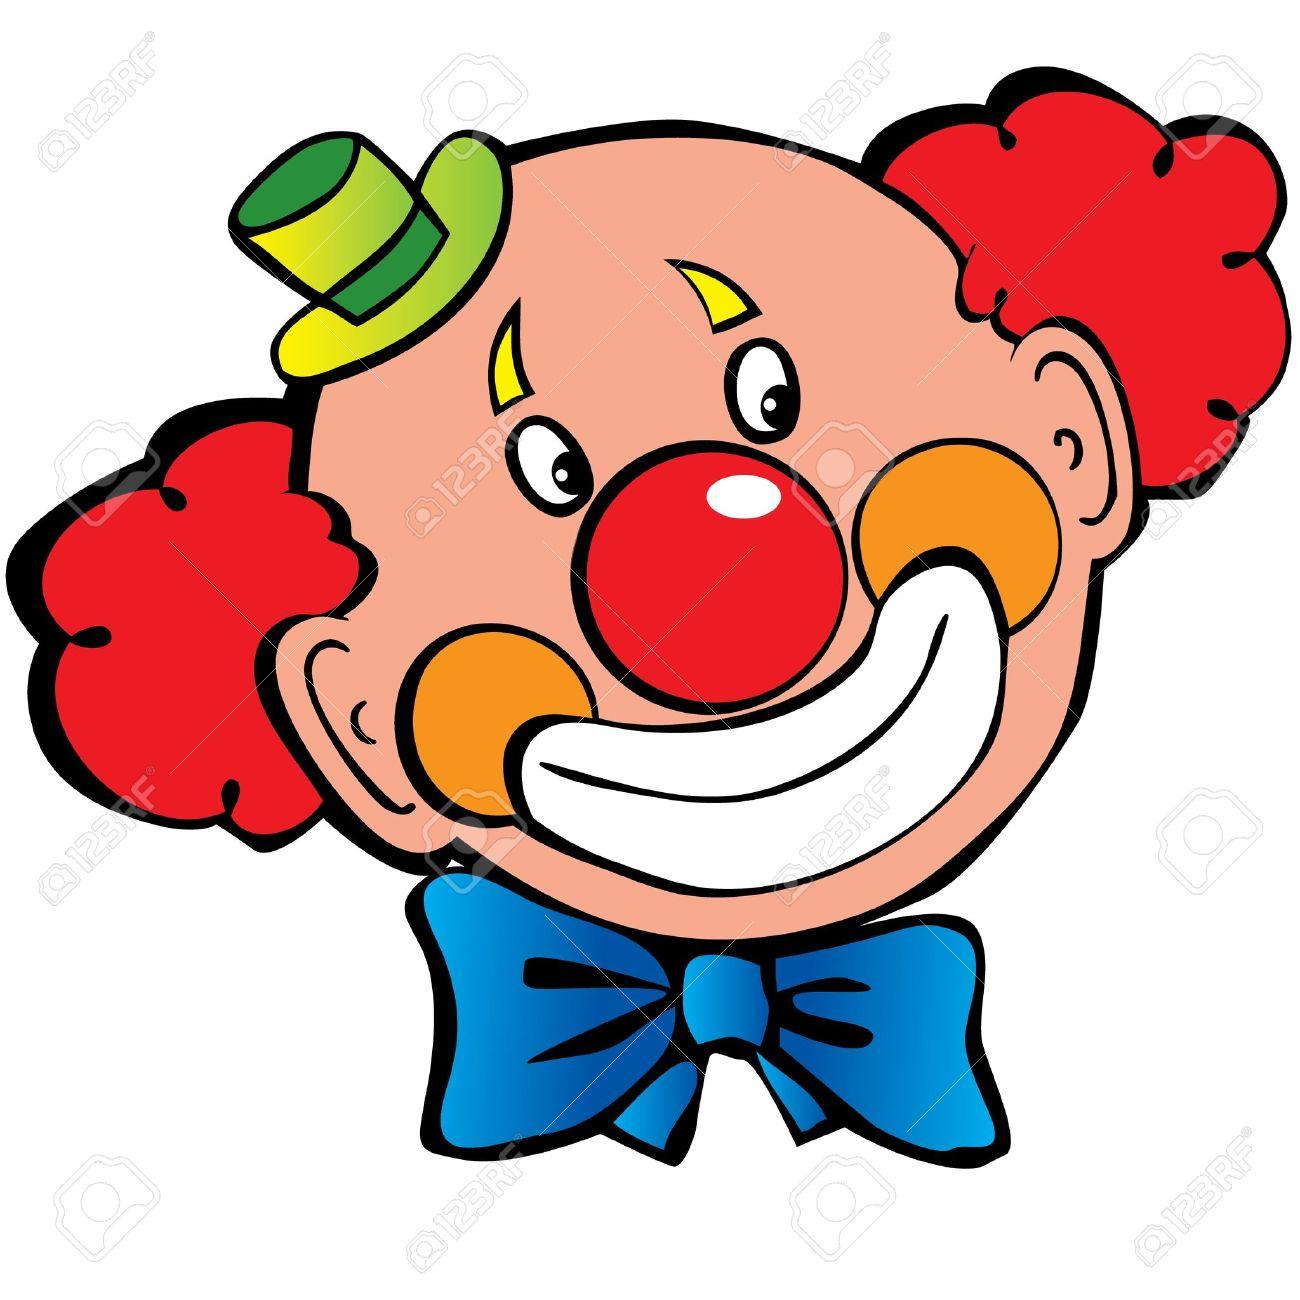 clowns: Happy clown art-illustration on -clowns: Happy clown art-illustration on a white background-10